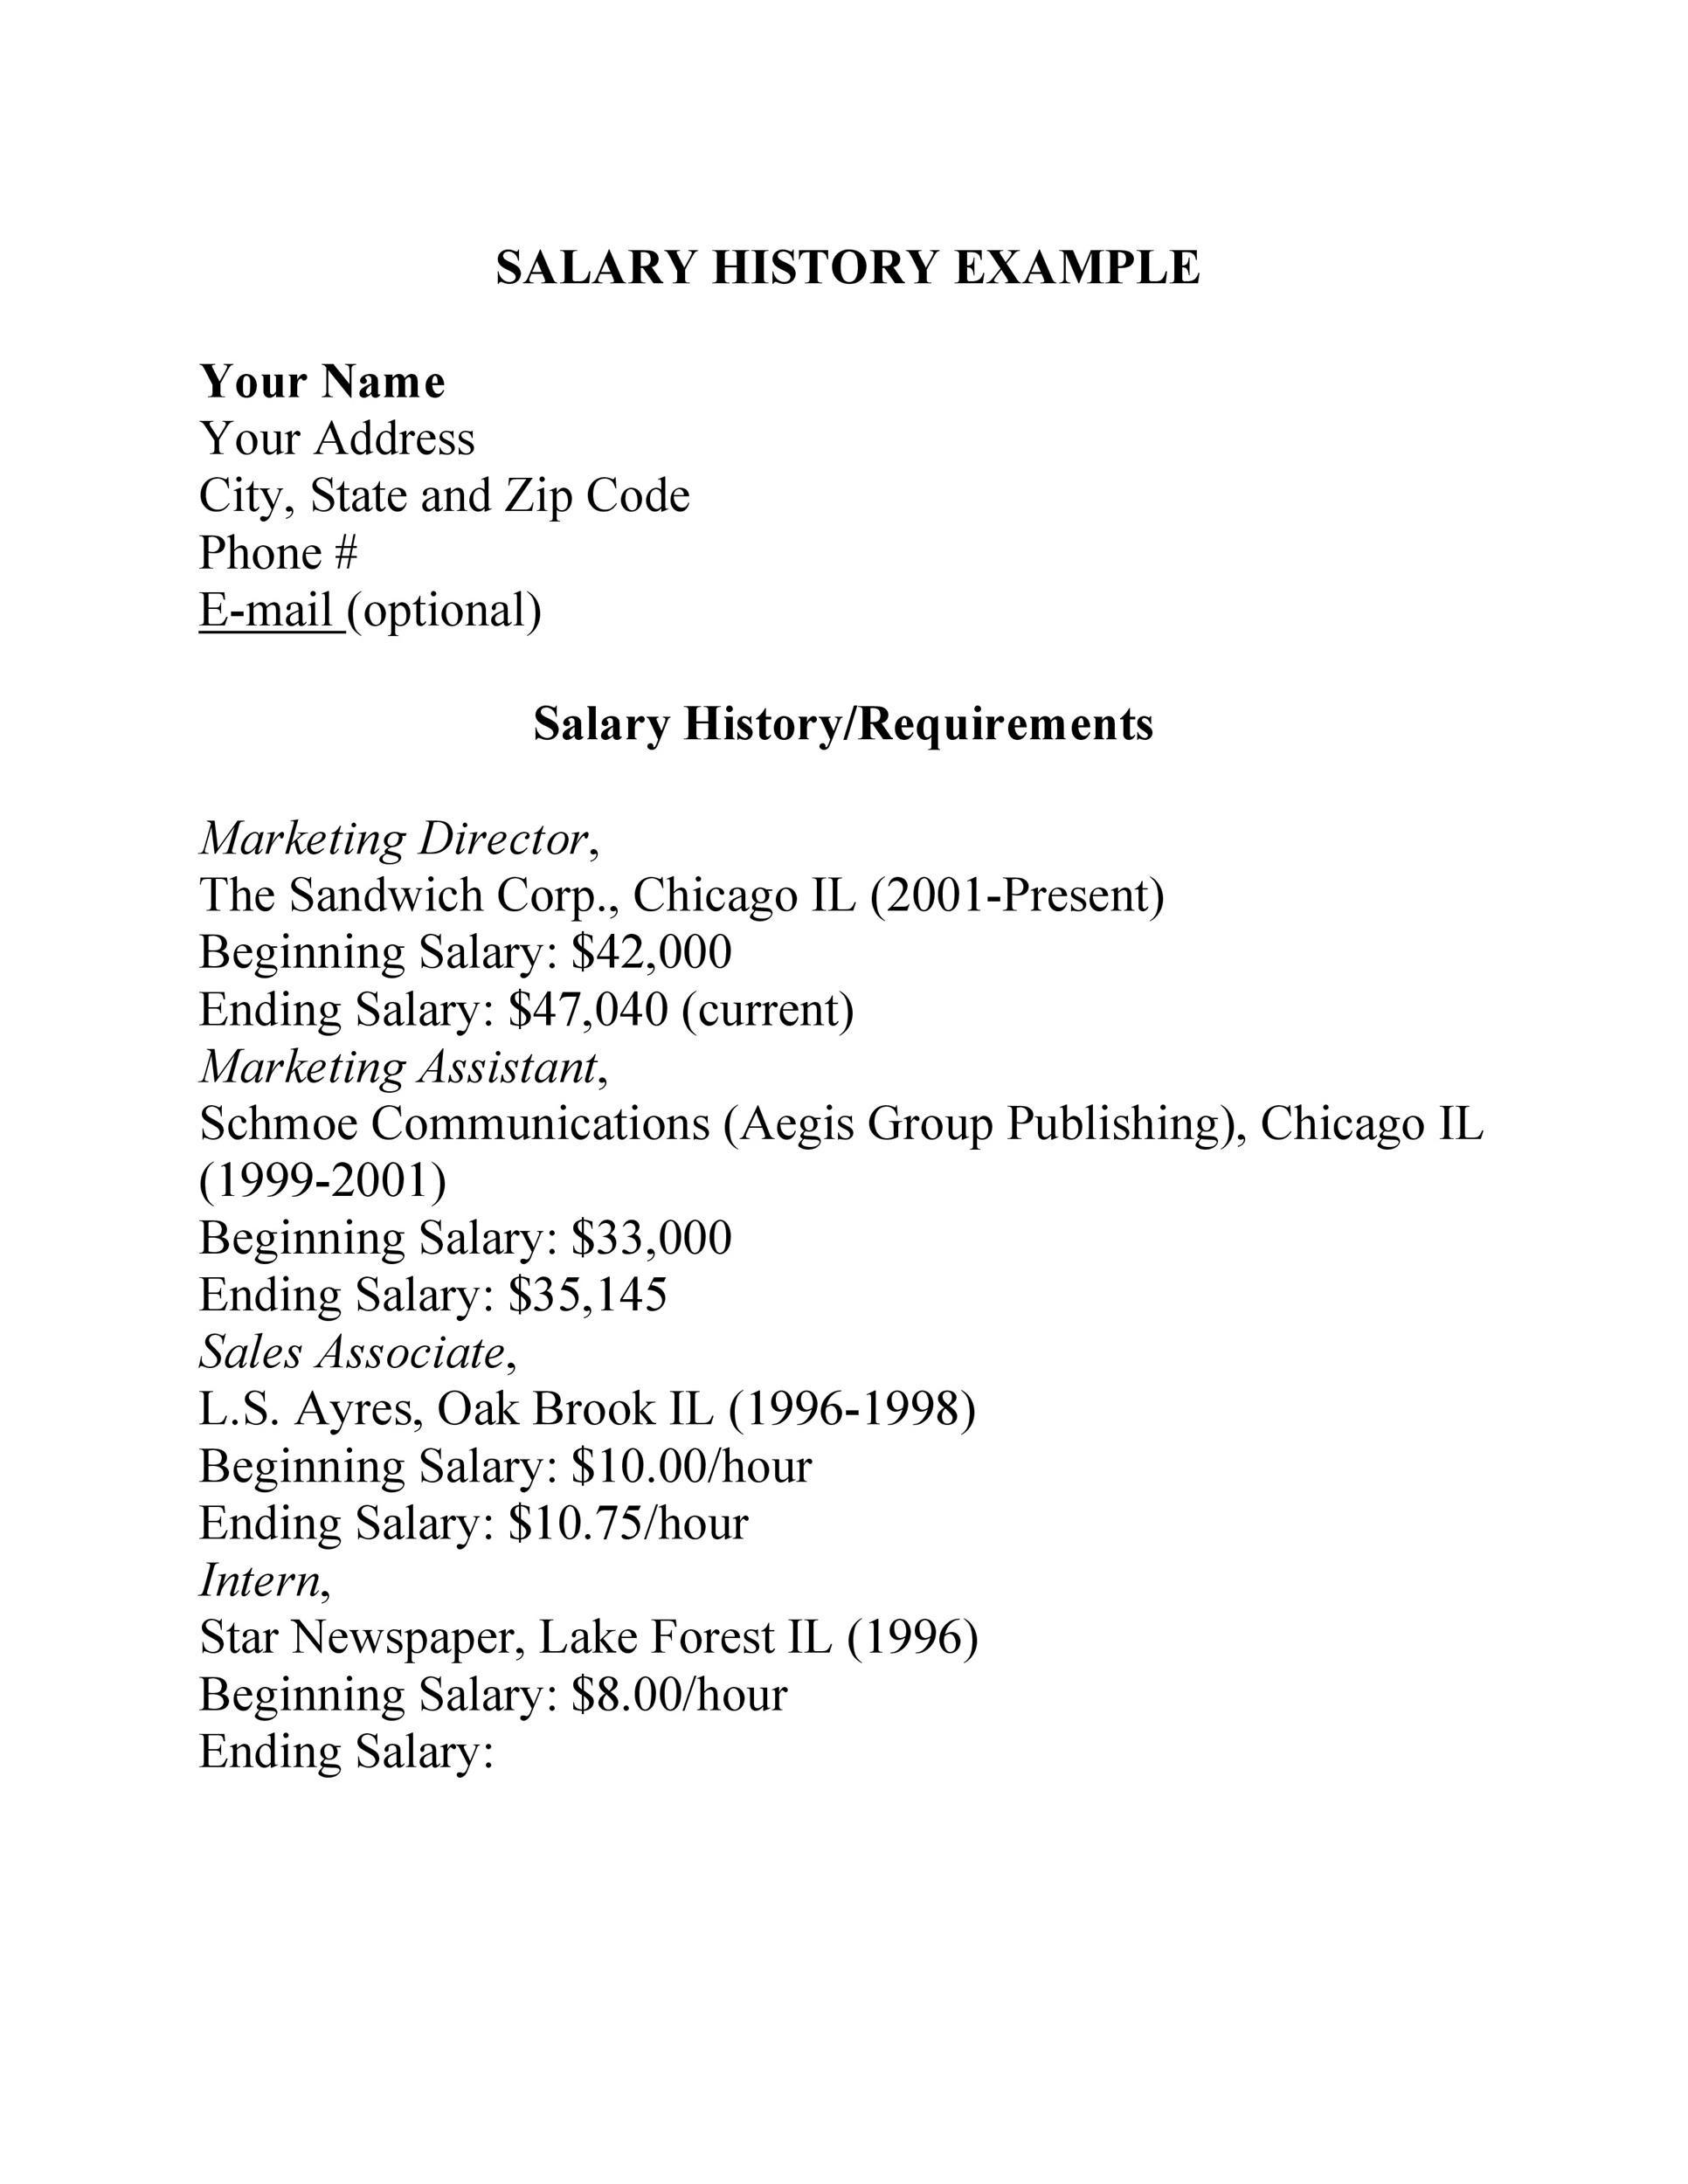 Salary History Template 16